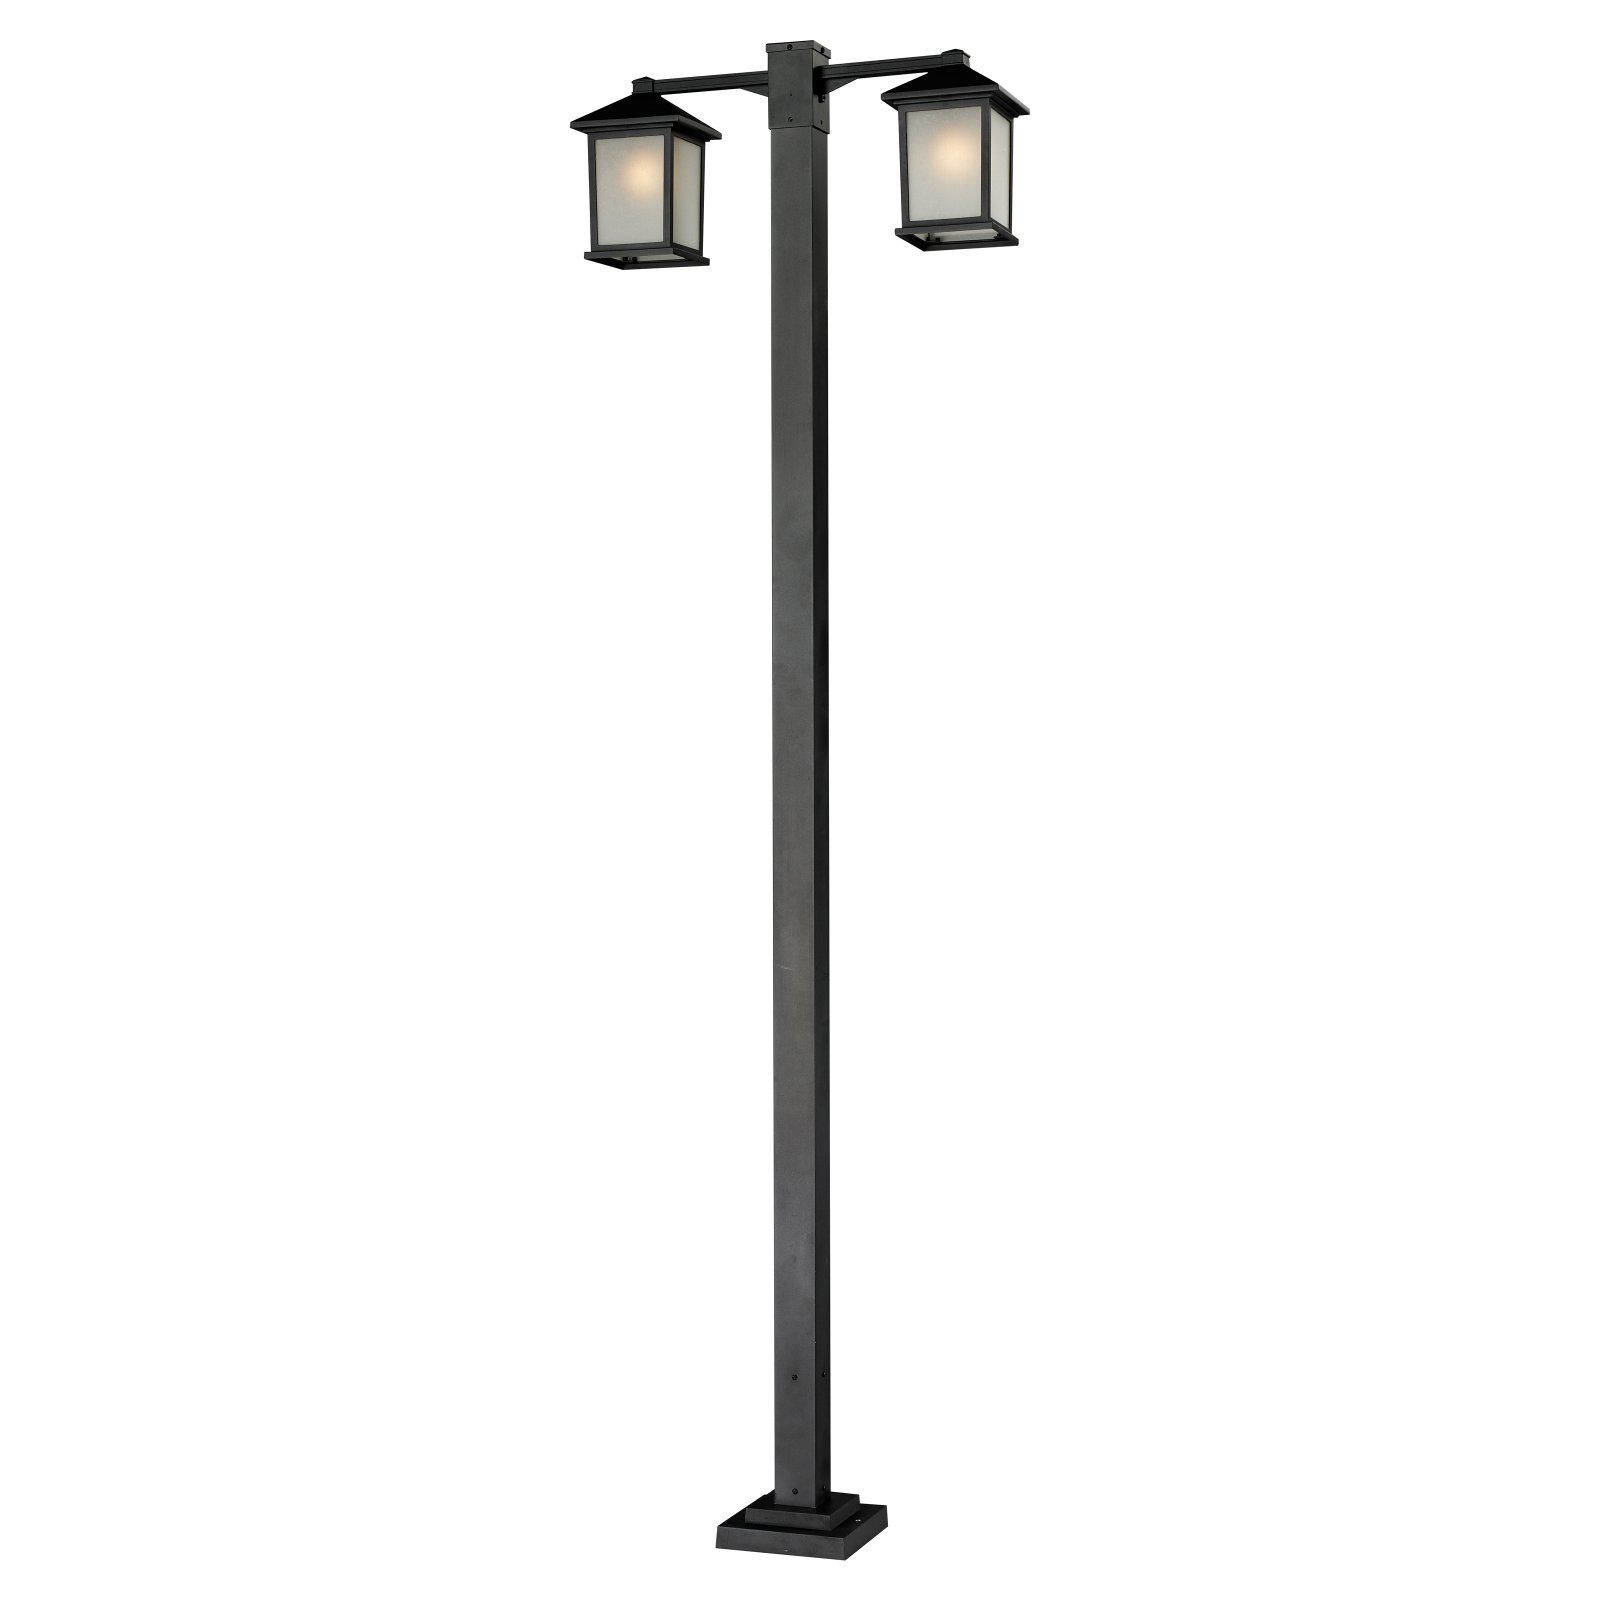 Z-Lite Holbrook 507 Outdoor Post Light